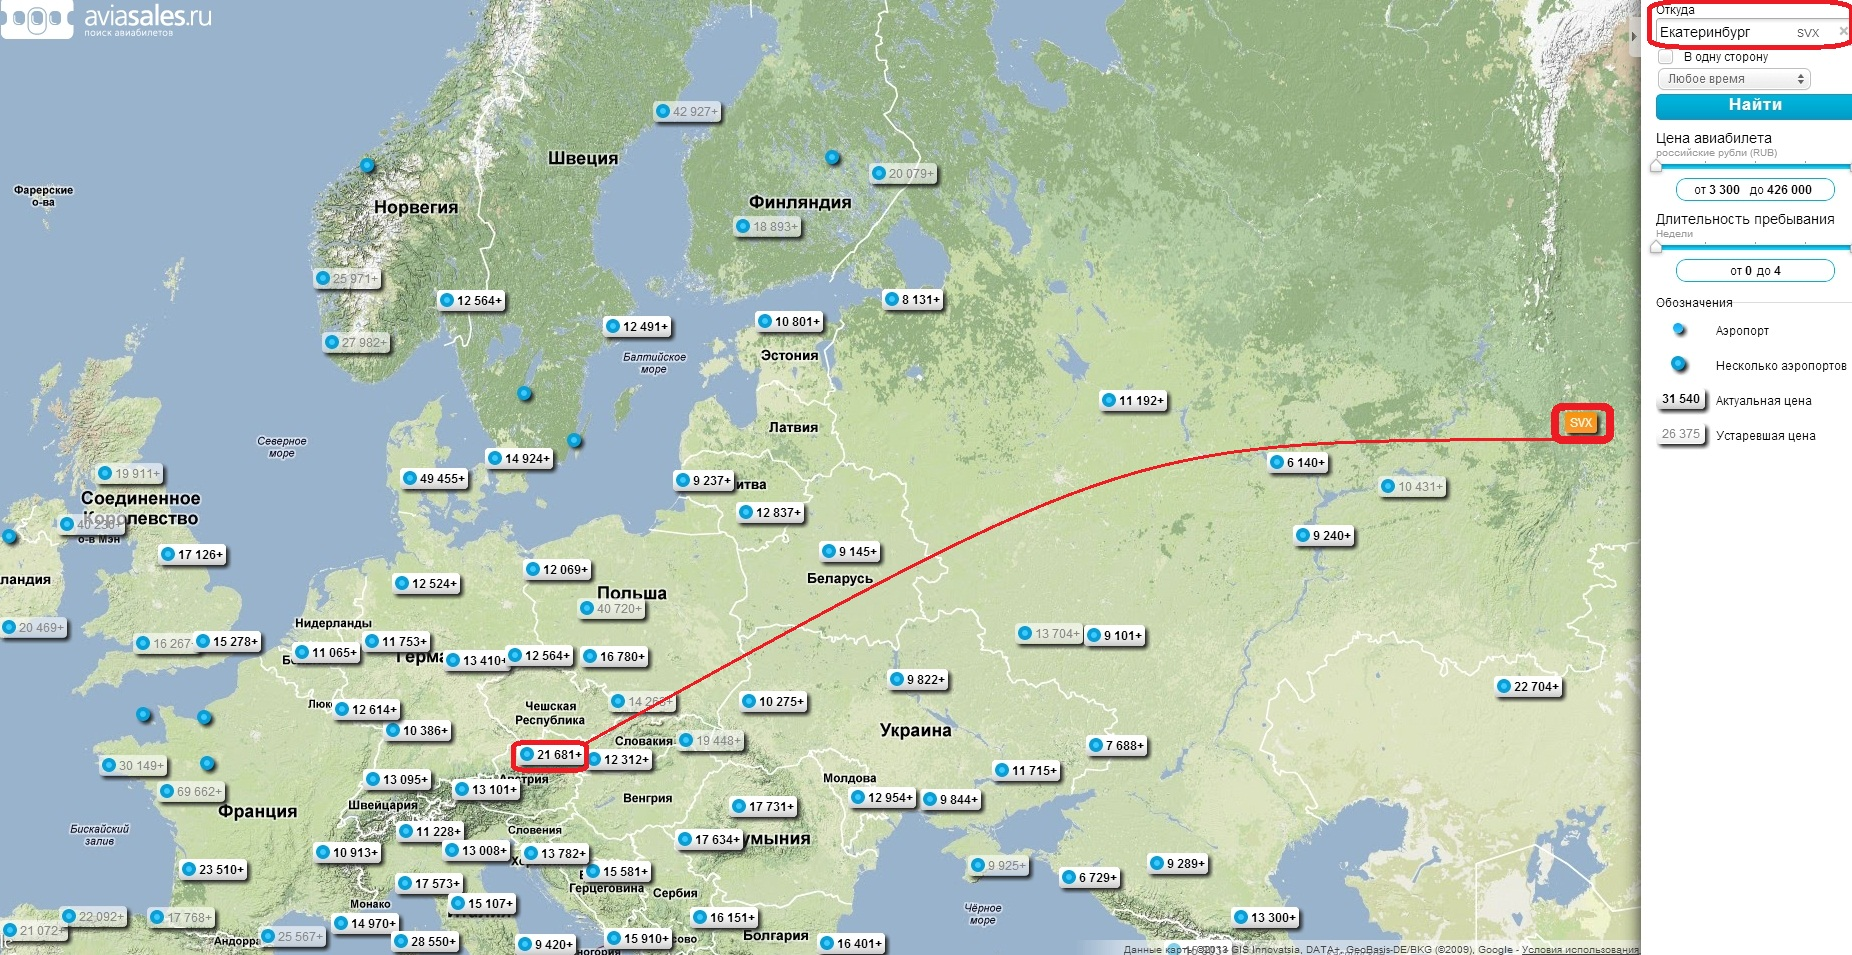 схема маршрута тюмень - екатеринбург жд